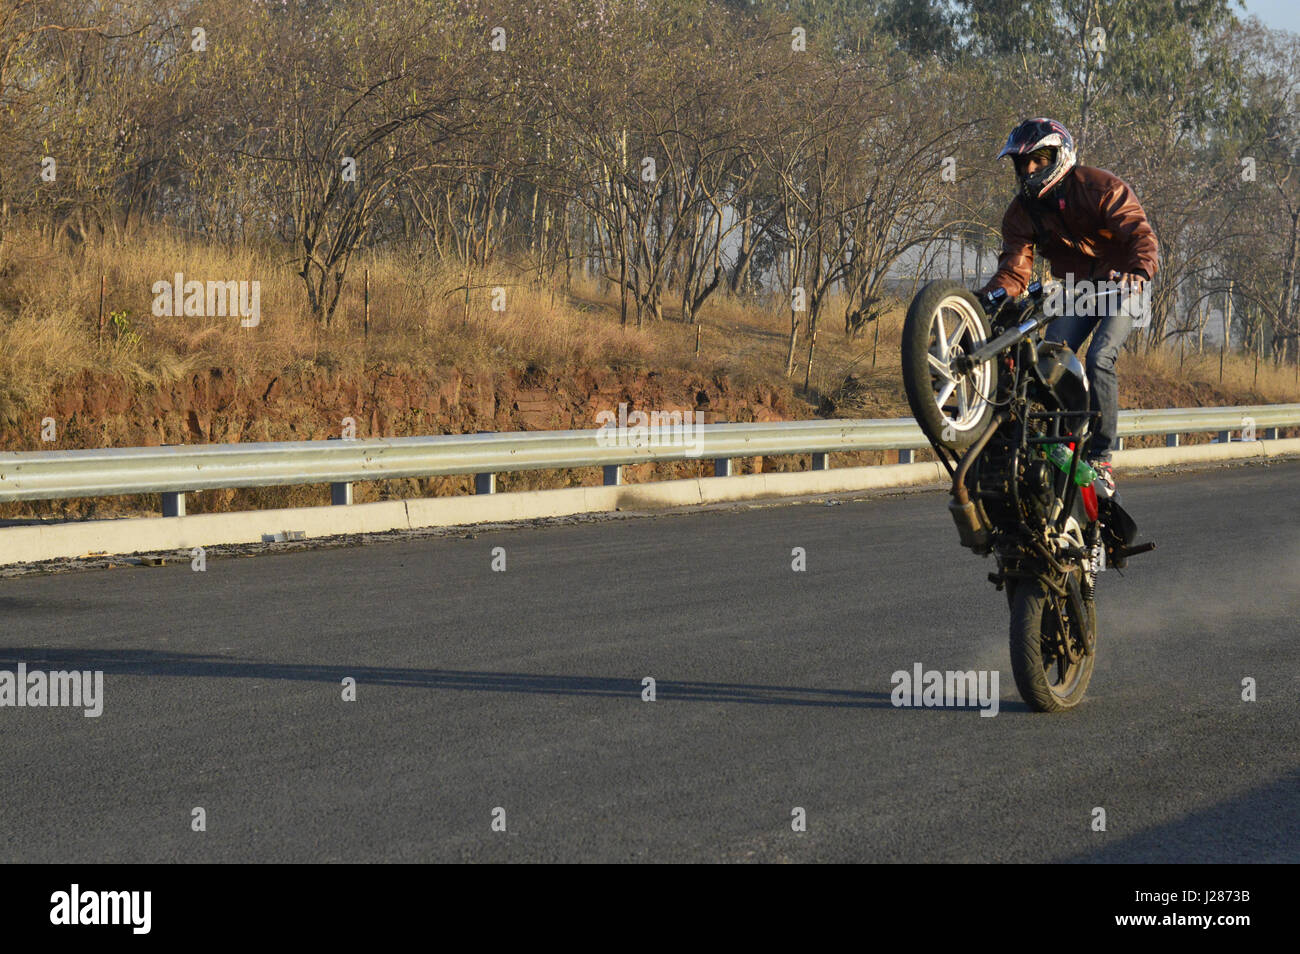 Stunt motorcycle rider performing at a local road near Pune, Maharashtra - Stock Image